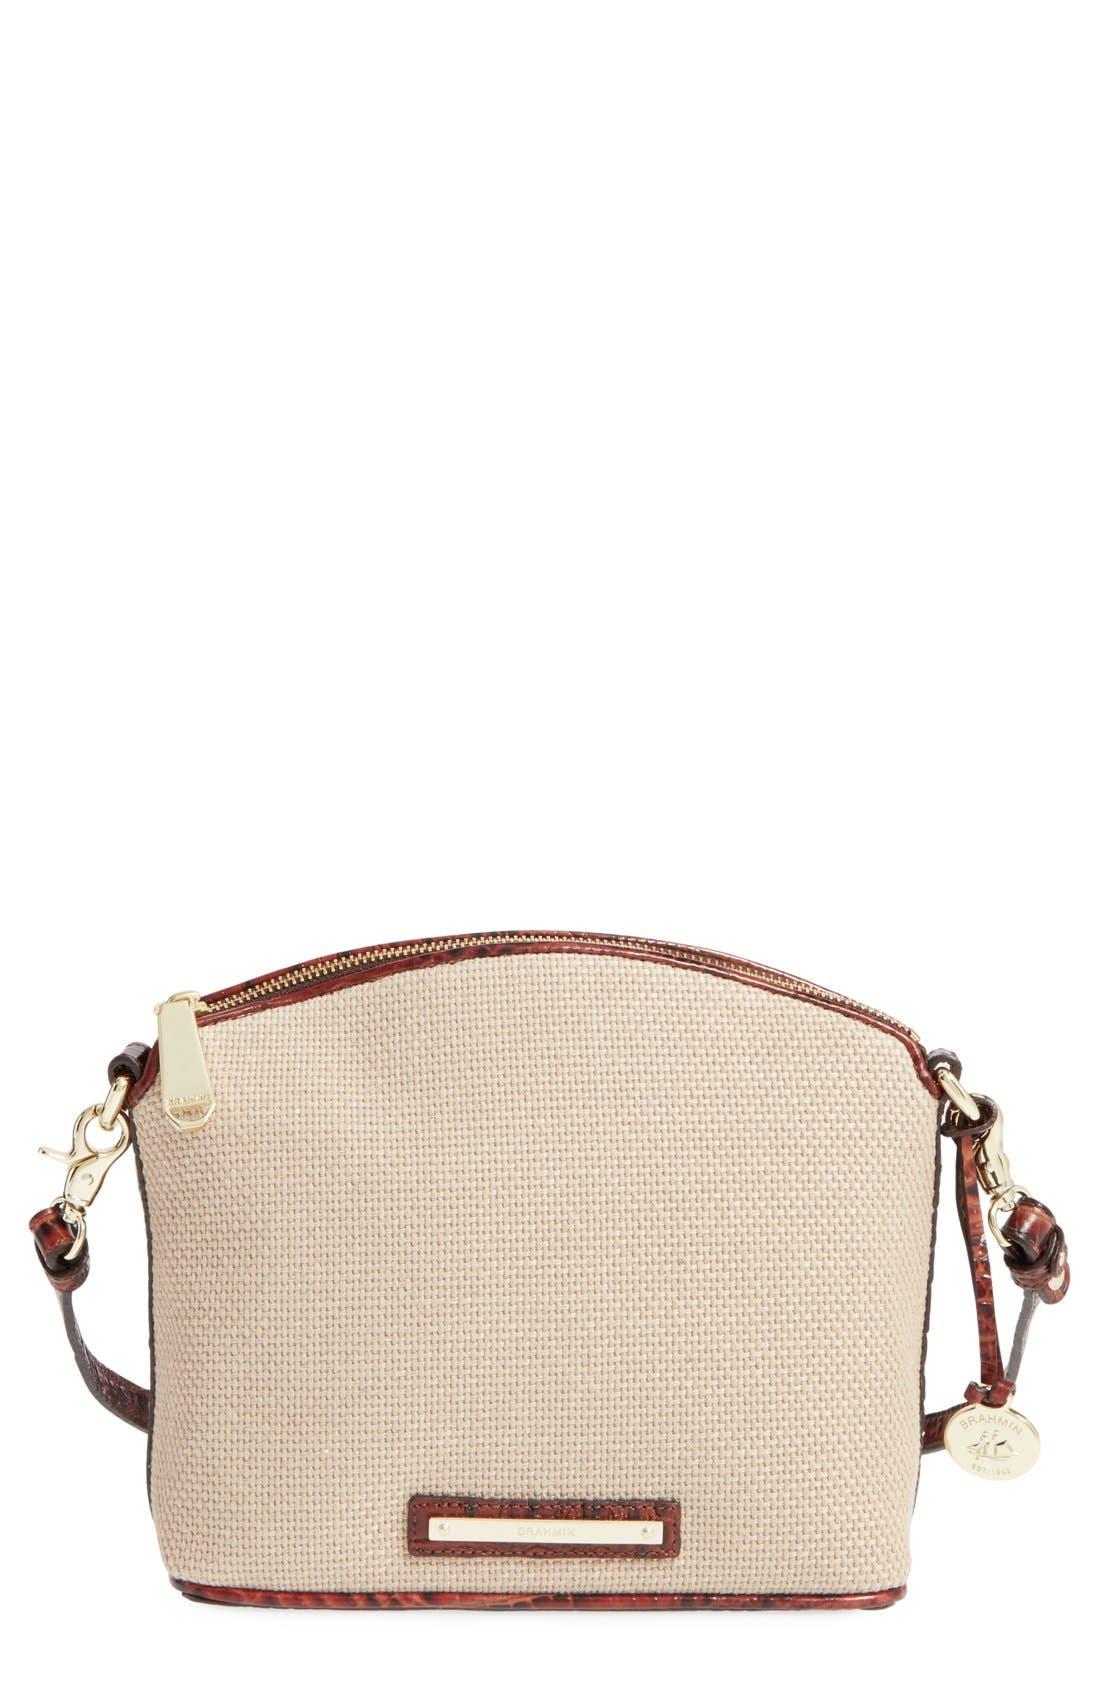 Main Image - Brahmin 'Mini Duxbury' Woven Crossbody Bag